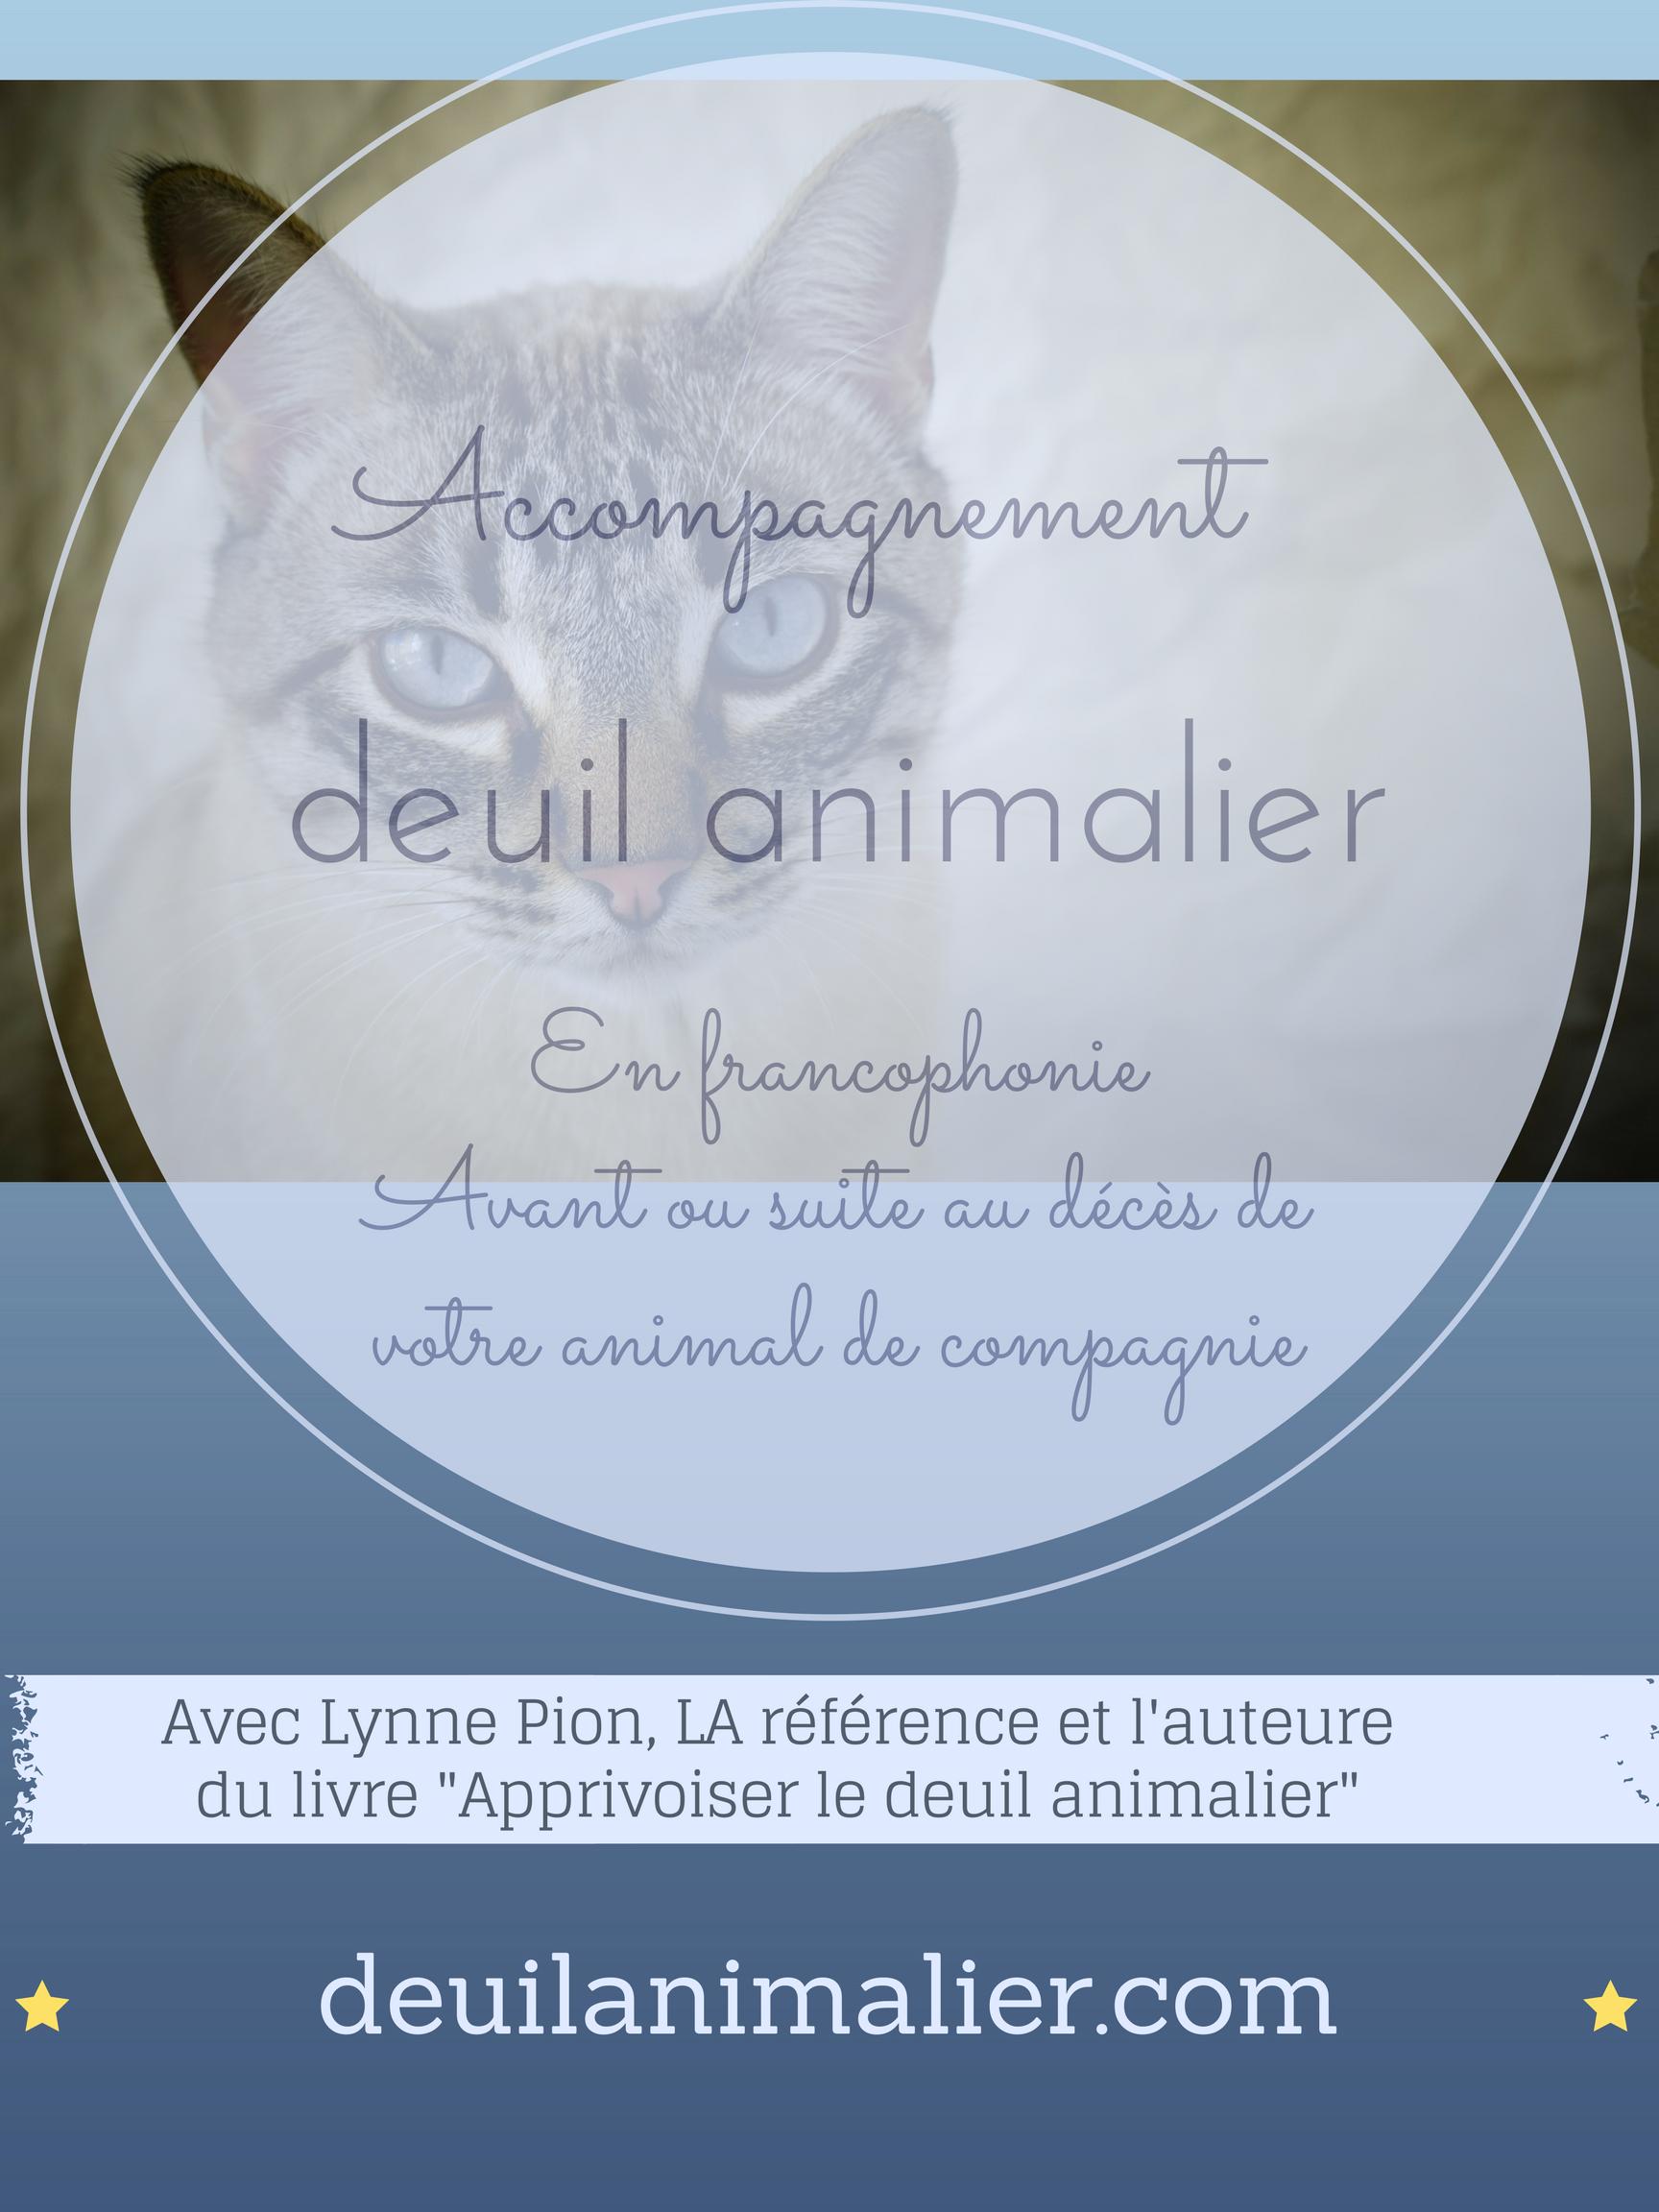 Accompagnement au deuil animalier 2 avec Lynne Pion.png